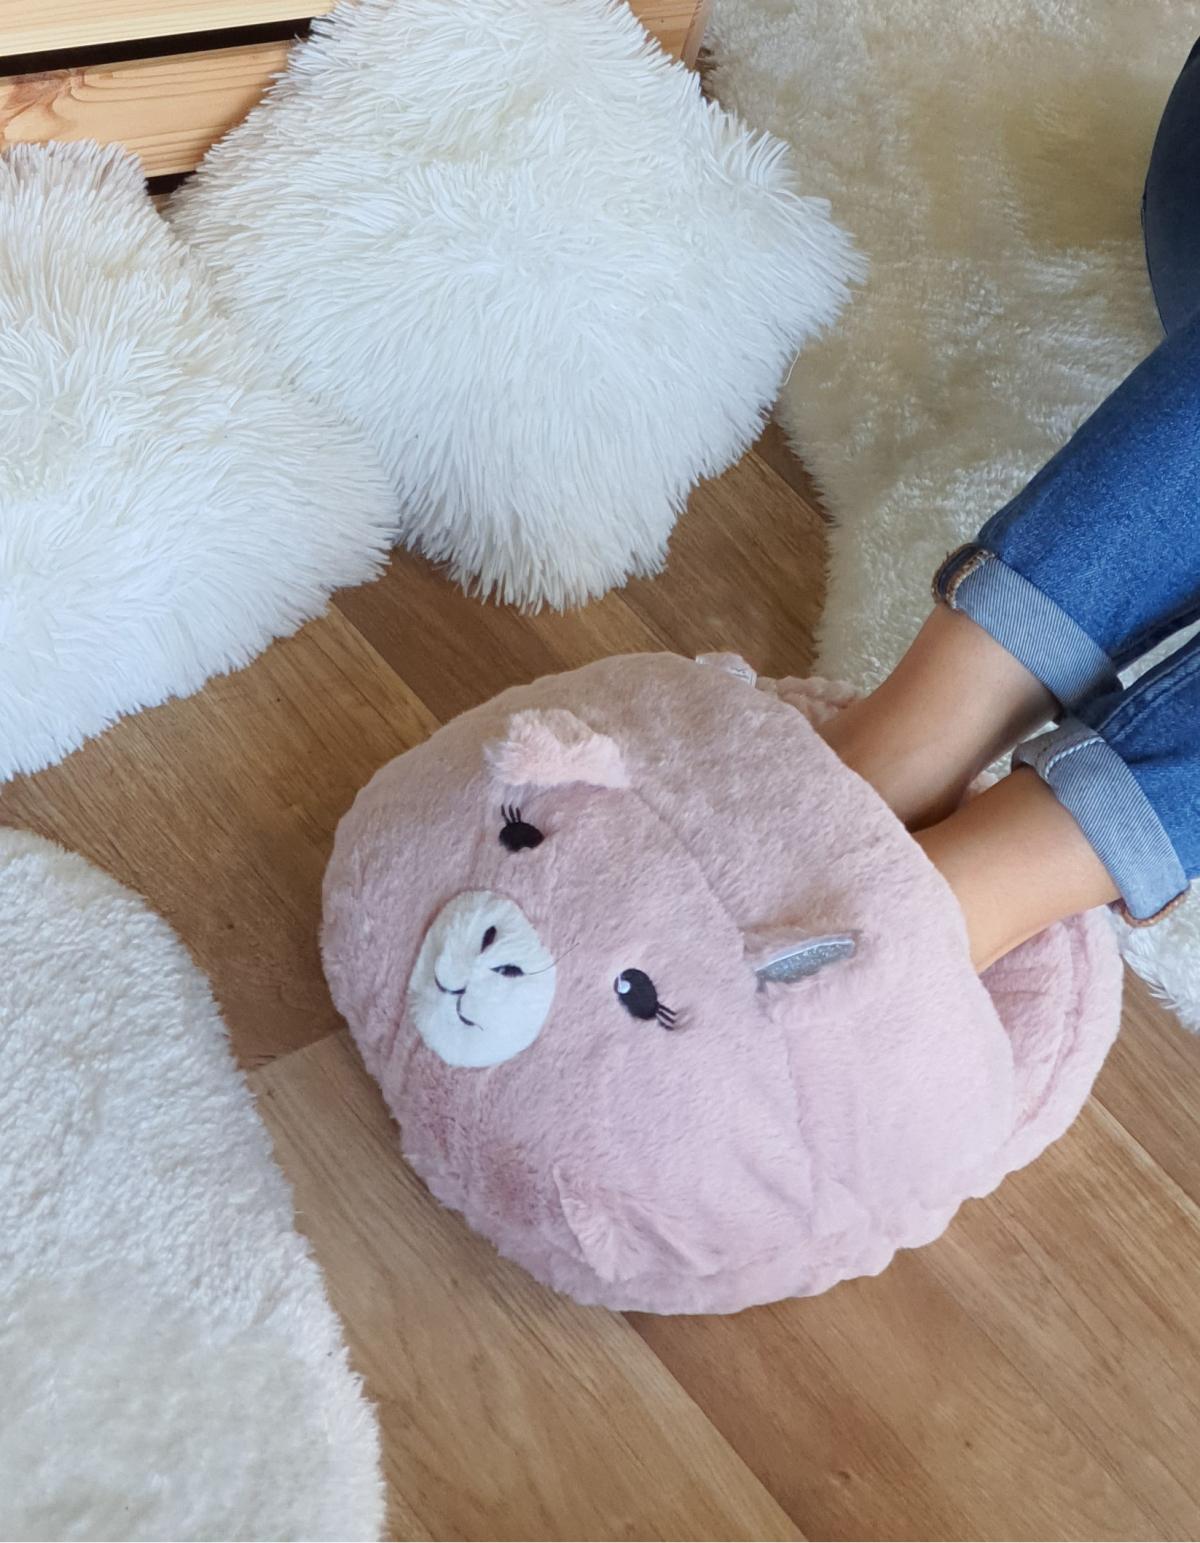 Oversized cozy παντόφλα γουρουνάκι - Ροζ